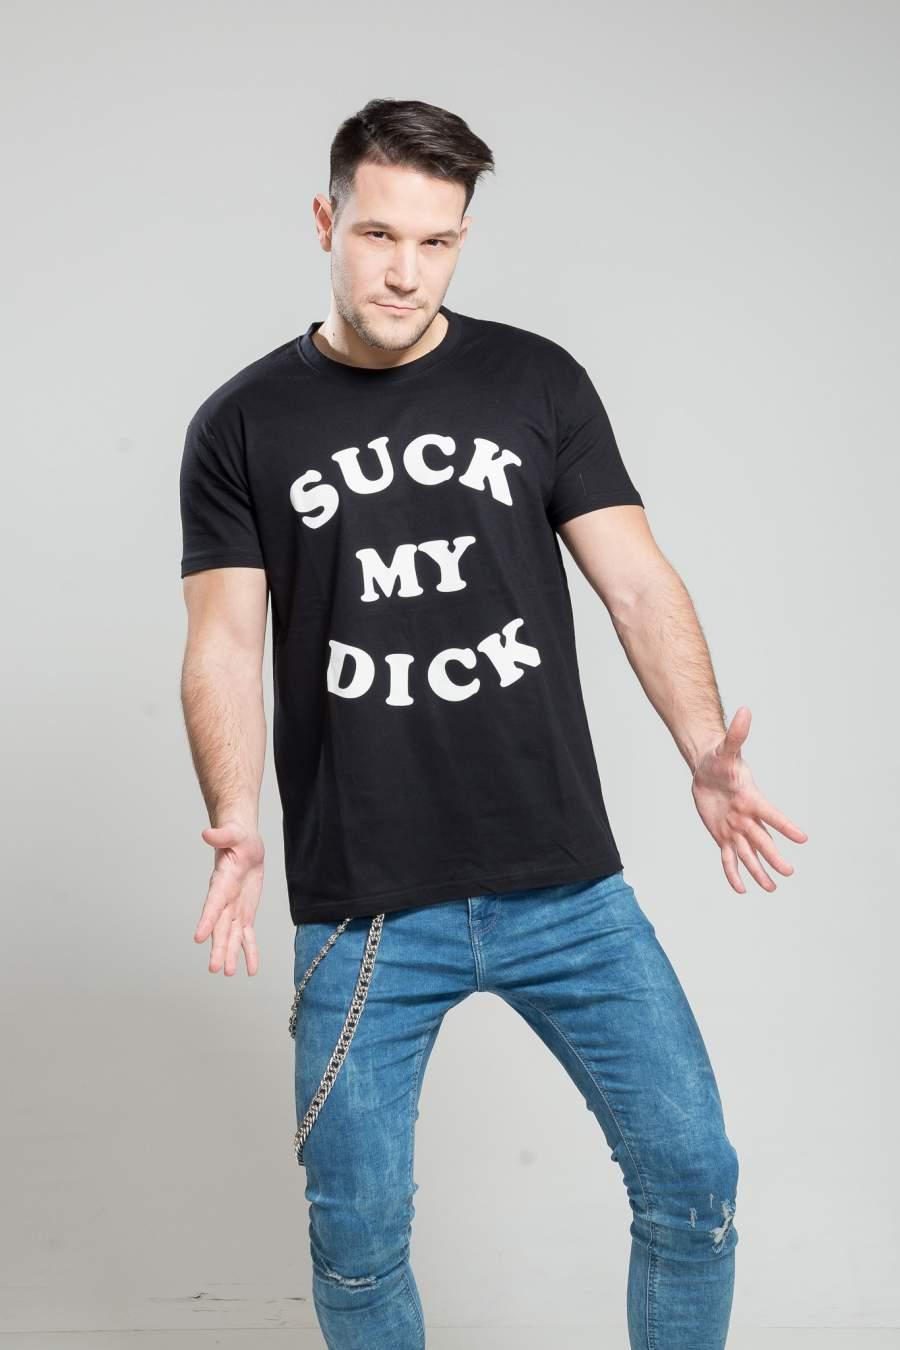 RMS - SUCK MY DICK